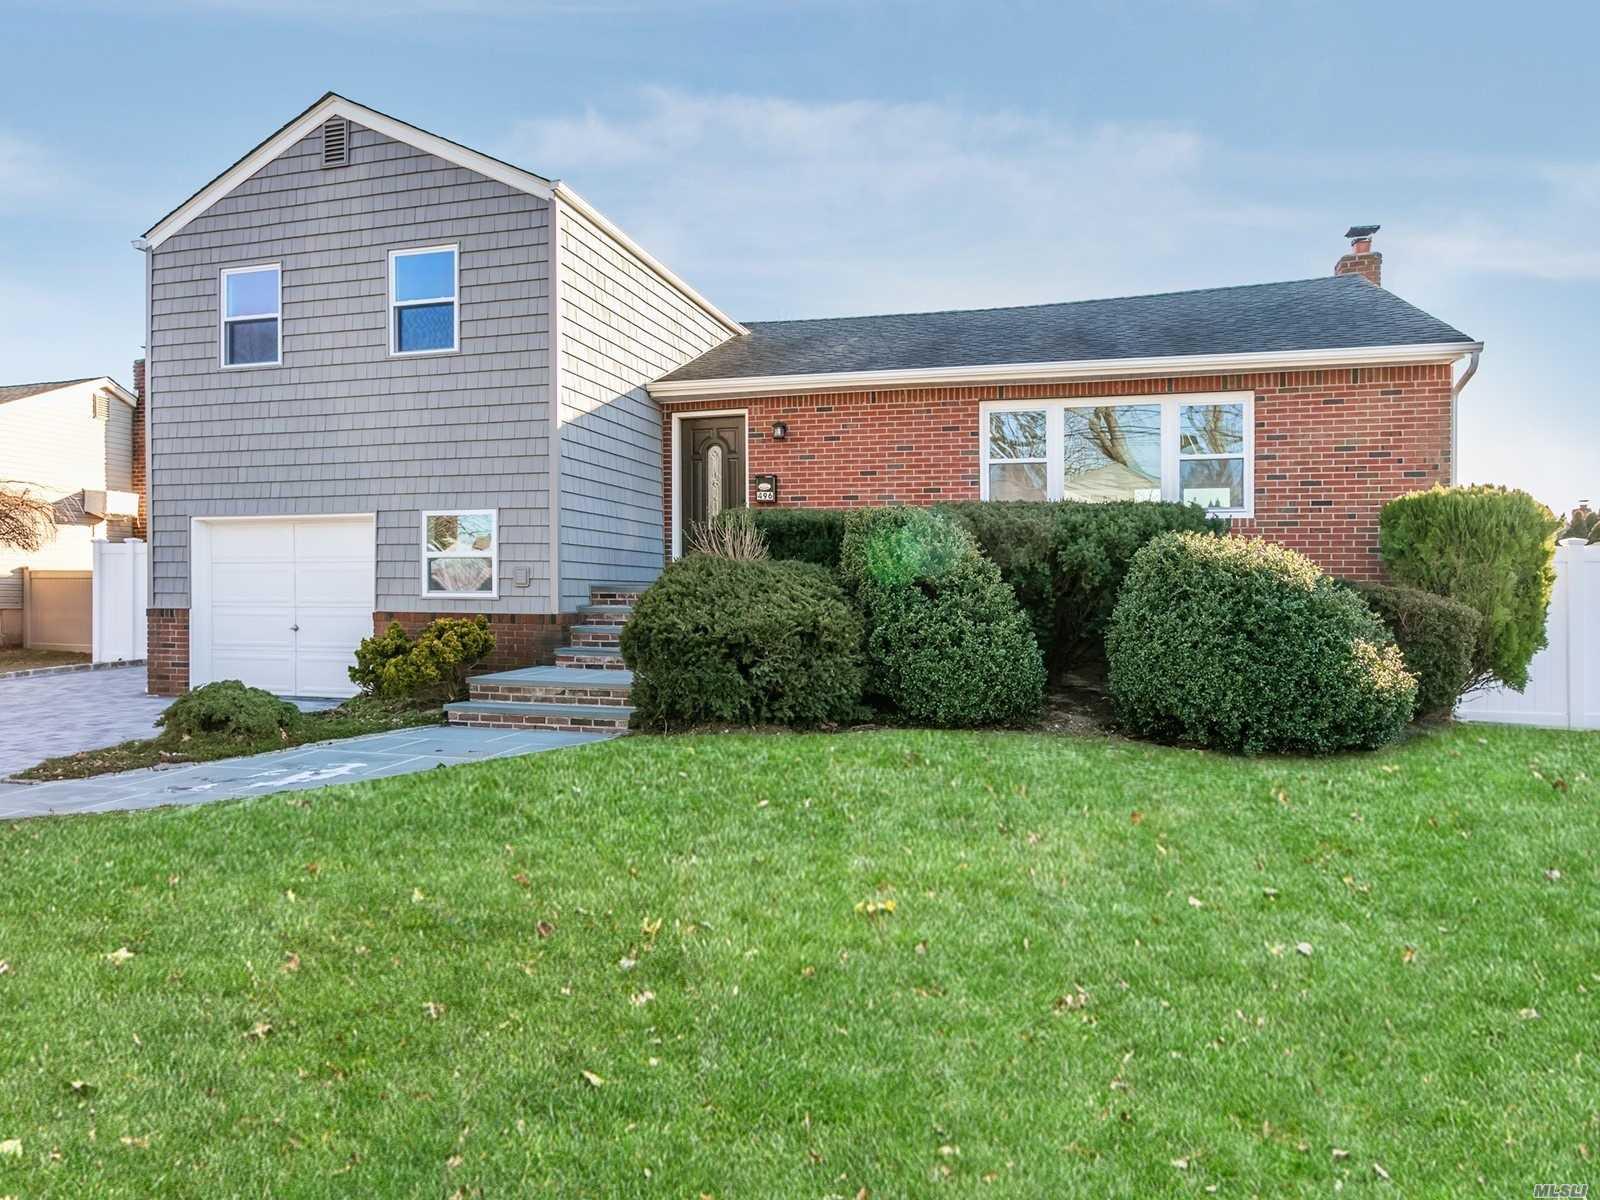 496 N Atlanta Ave 11758 - One of Massapequa Homes for Sale